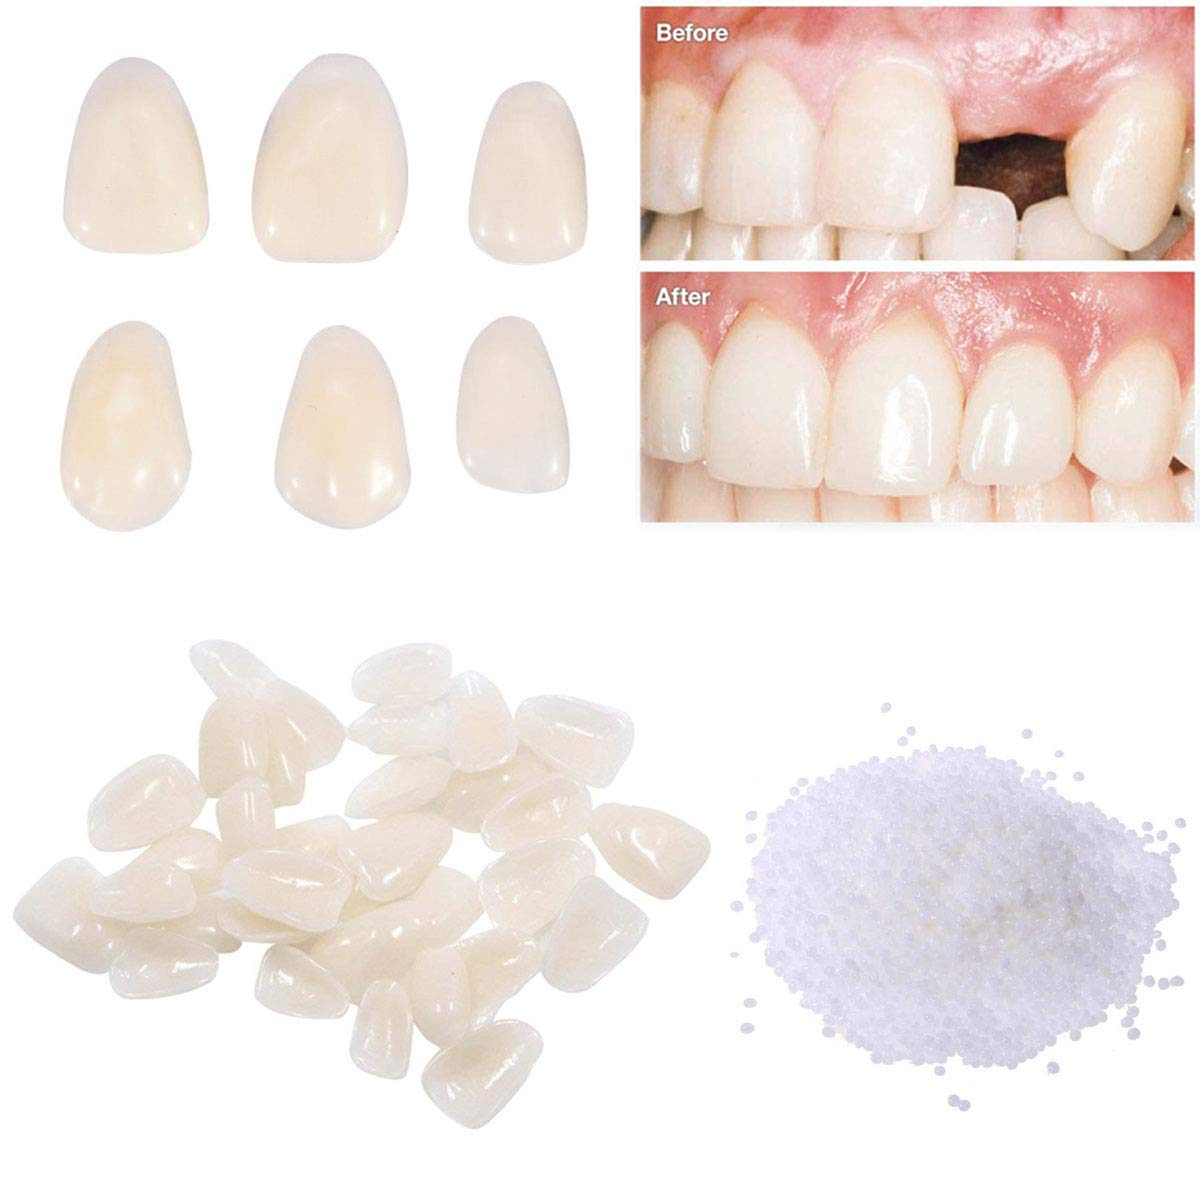 Temporary Tooth Repair Kit-Teeth Veneers for Fix the Missing Tooth Teaching,Thermal Fitting Beads for Filling the Broken Tooth and Teeth Gap, Resin Fake Teeth Crown : Beauty